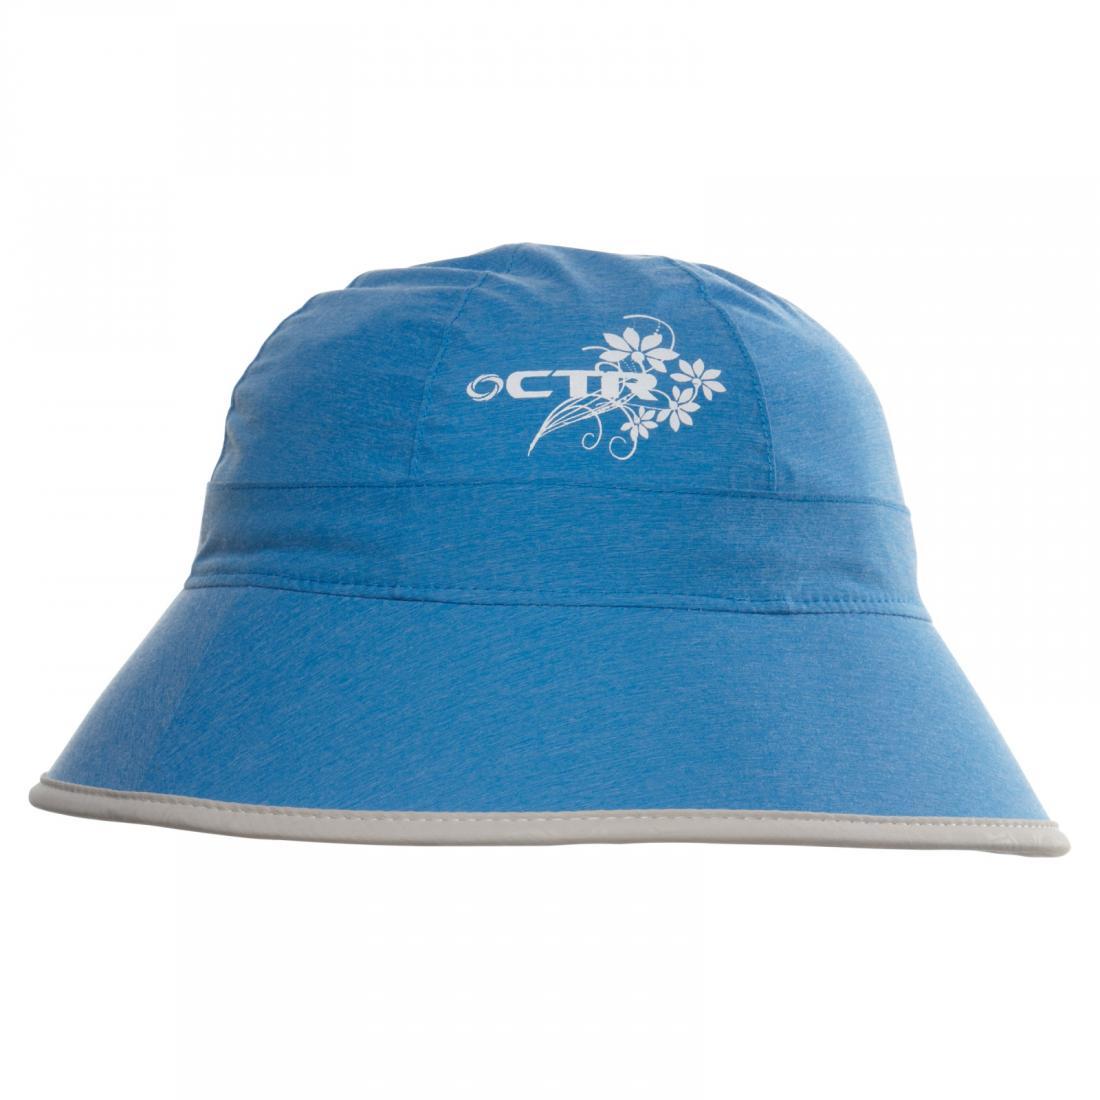 Панама Chaos  Stratus Cloche Rain Hat (женс)Панамы<br><br><br>Цвет: Голубой<br>Размер: S-M